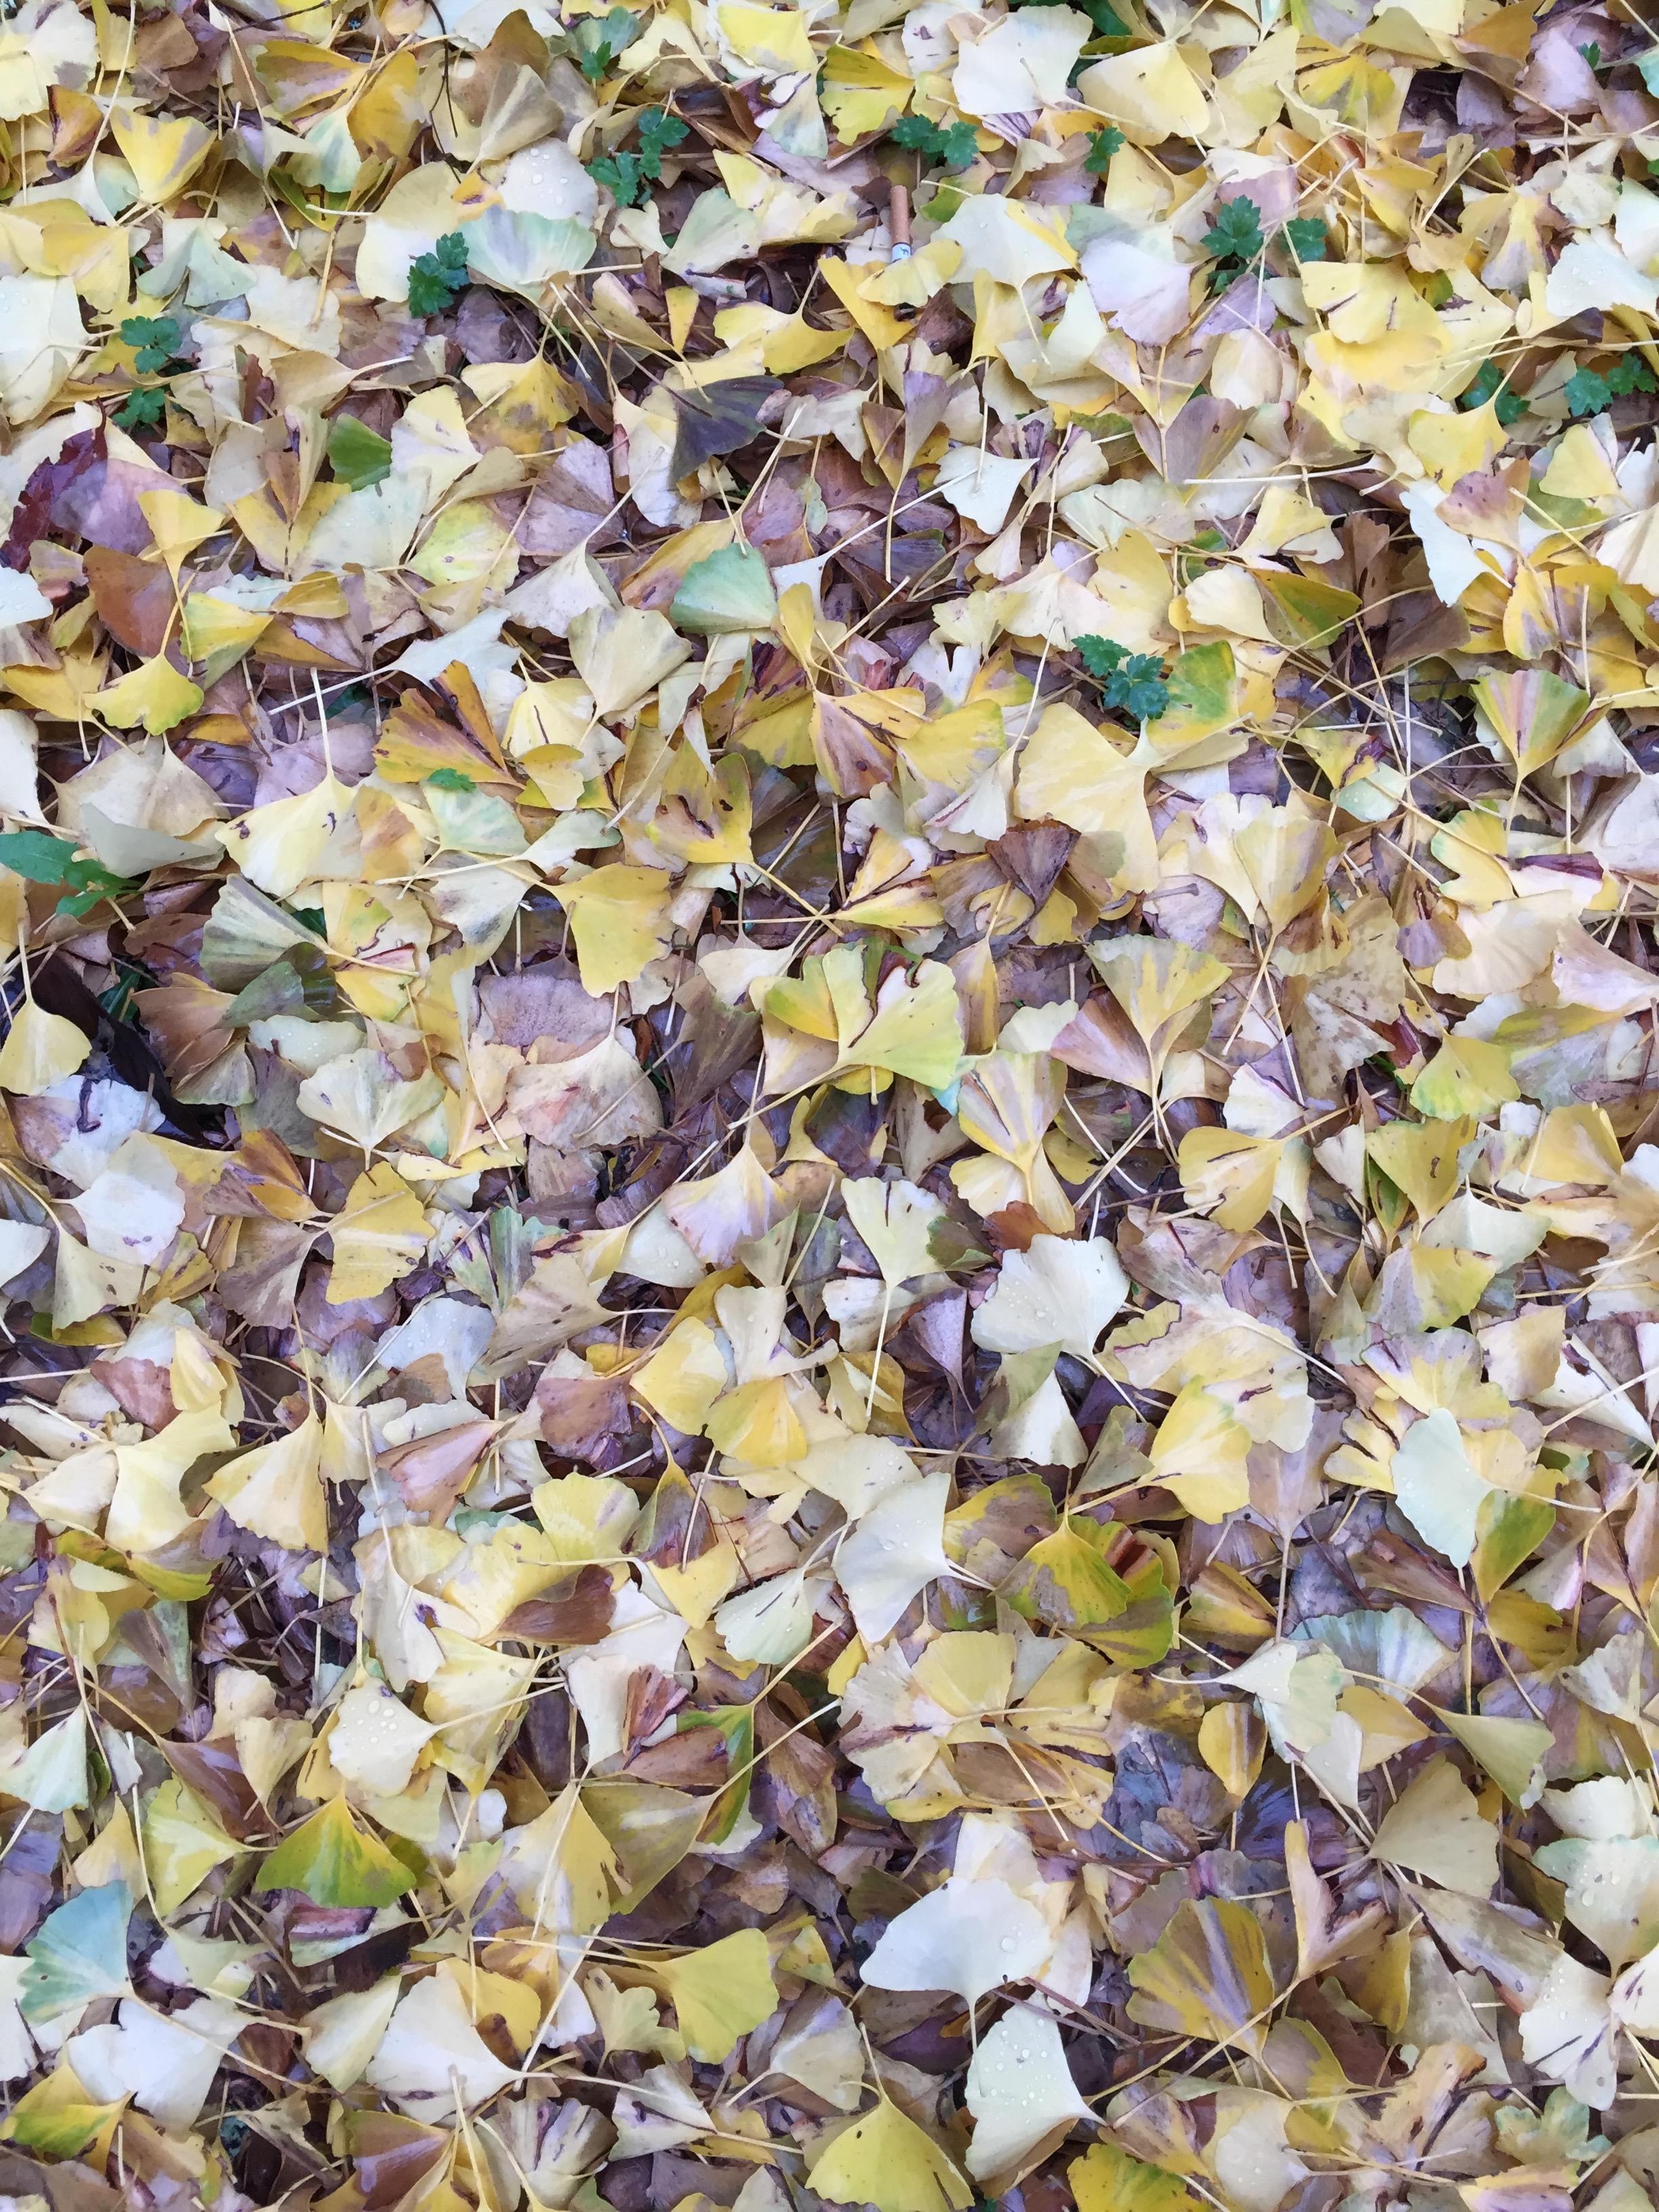 yellow-leaves-on-ground.jpg